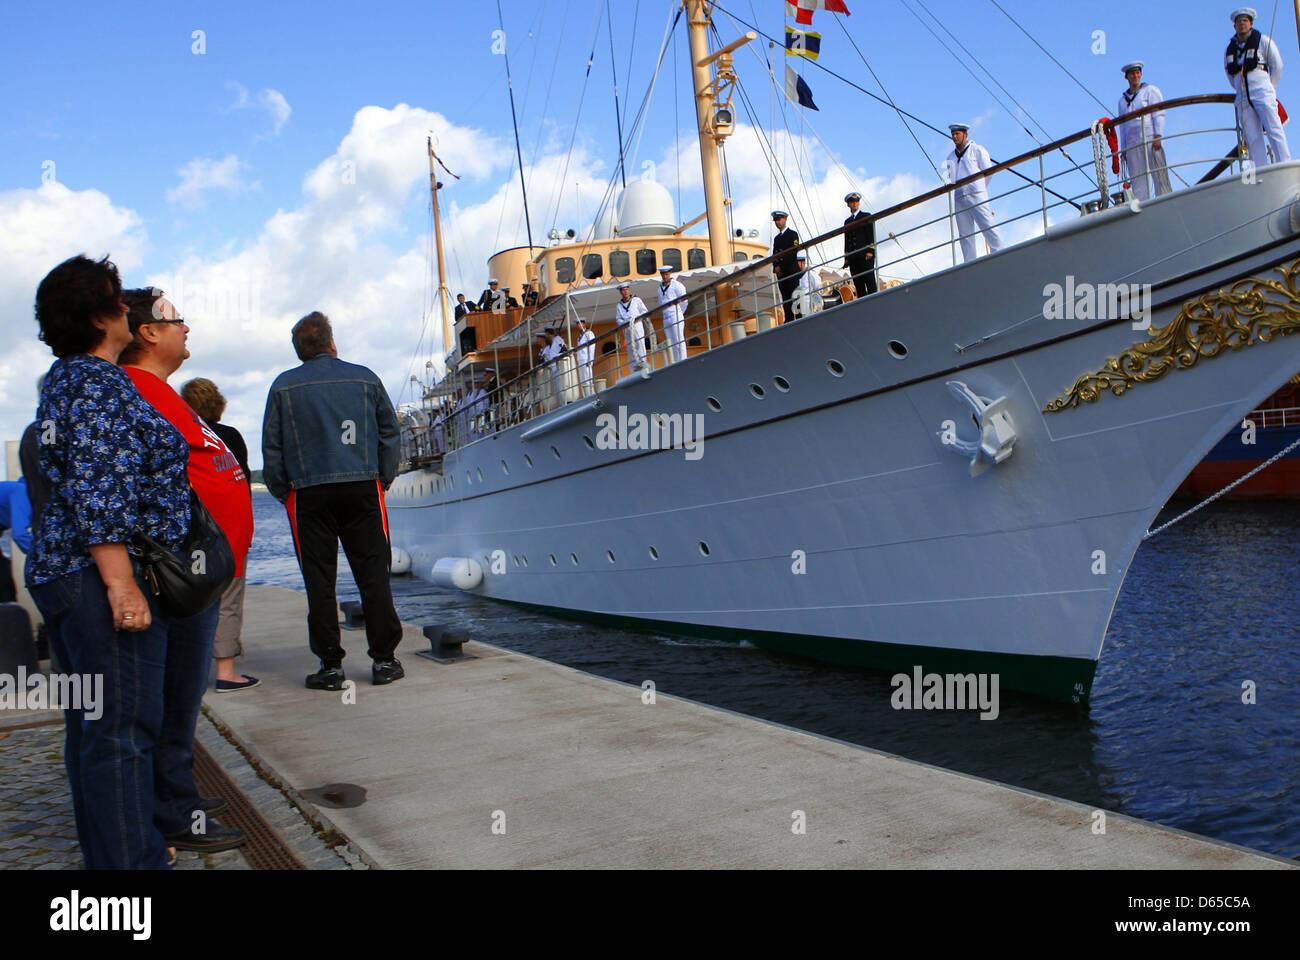 Henrik, Prince Consort of Denmark, arrives on the royal yacht 'Dannebrog' for his visit to Wismar in Wismar, - Stock Image